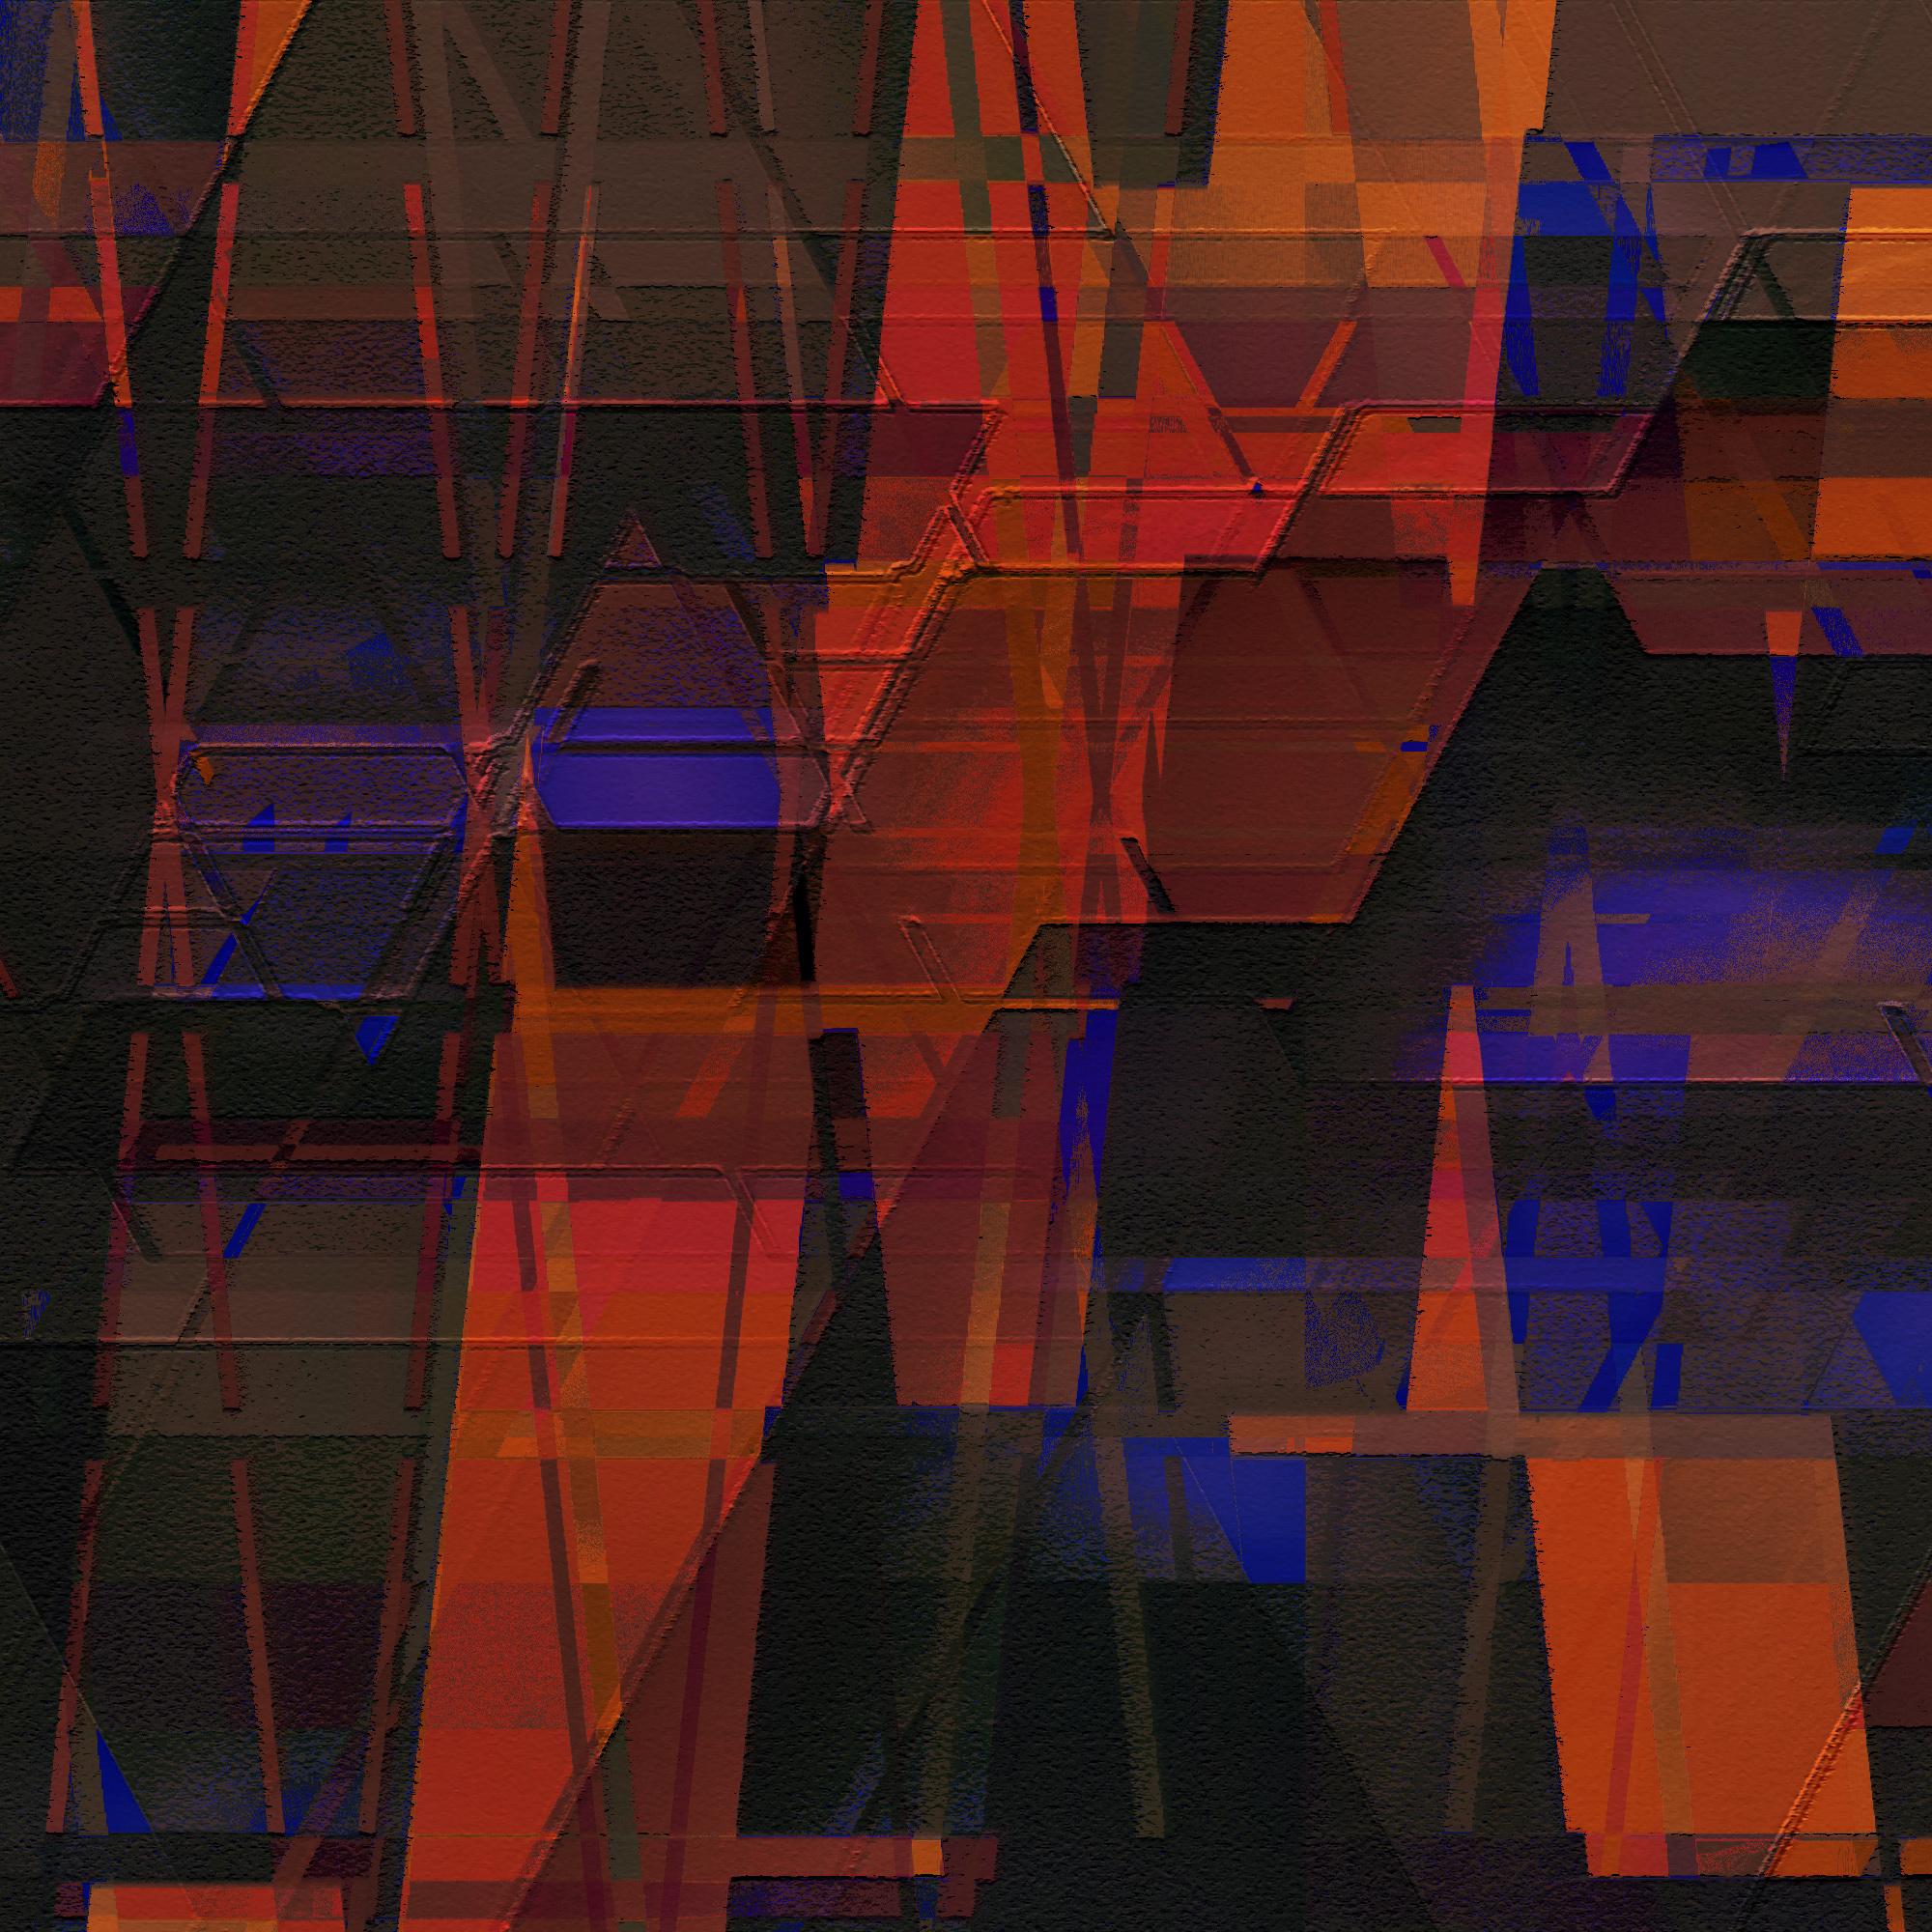 190404_Netherworld_detail4.jpg